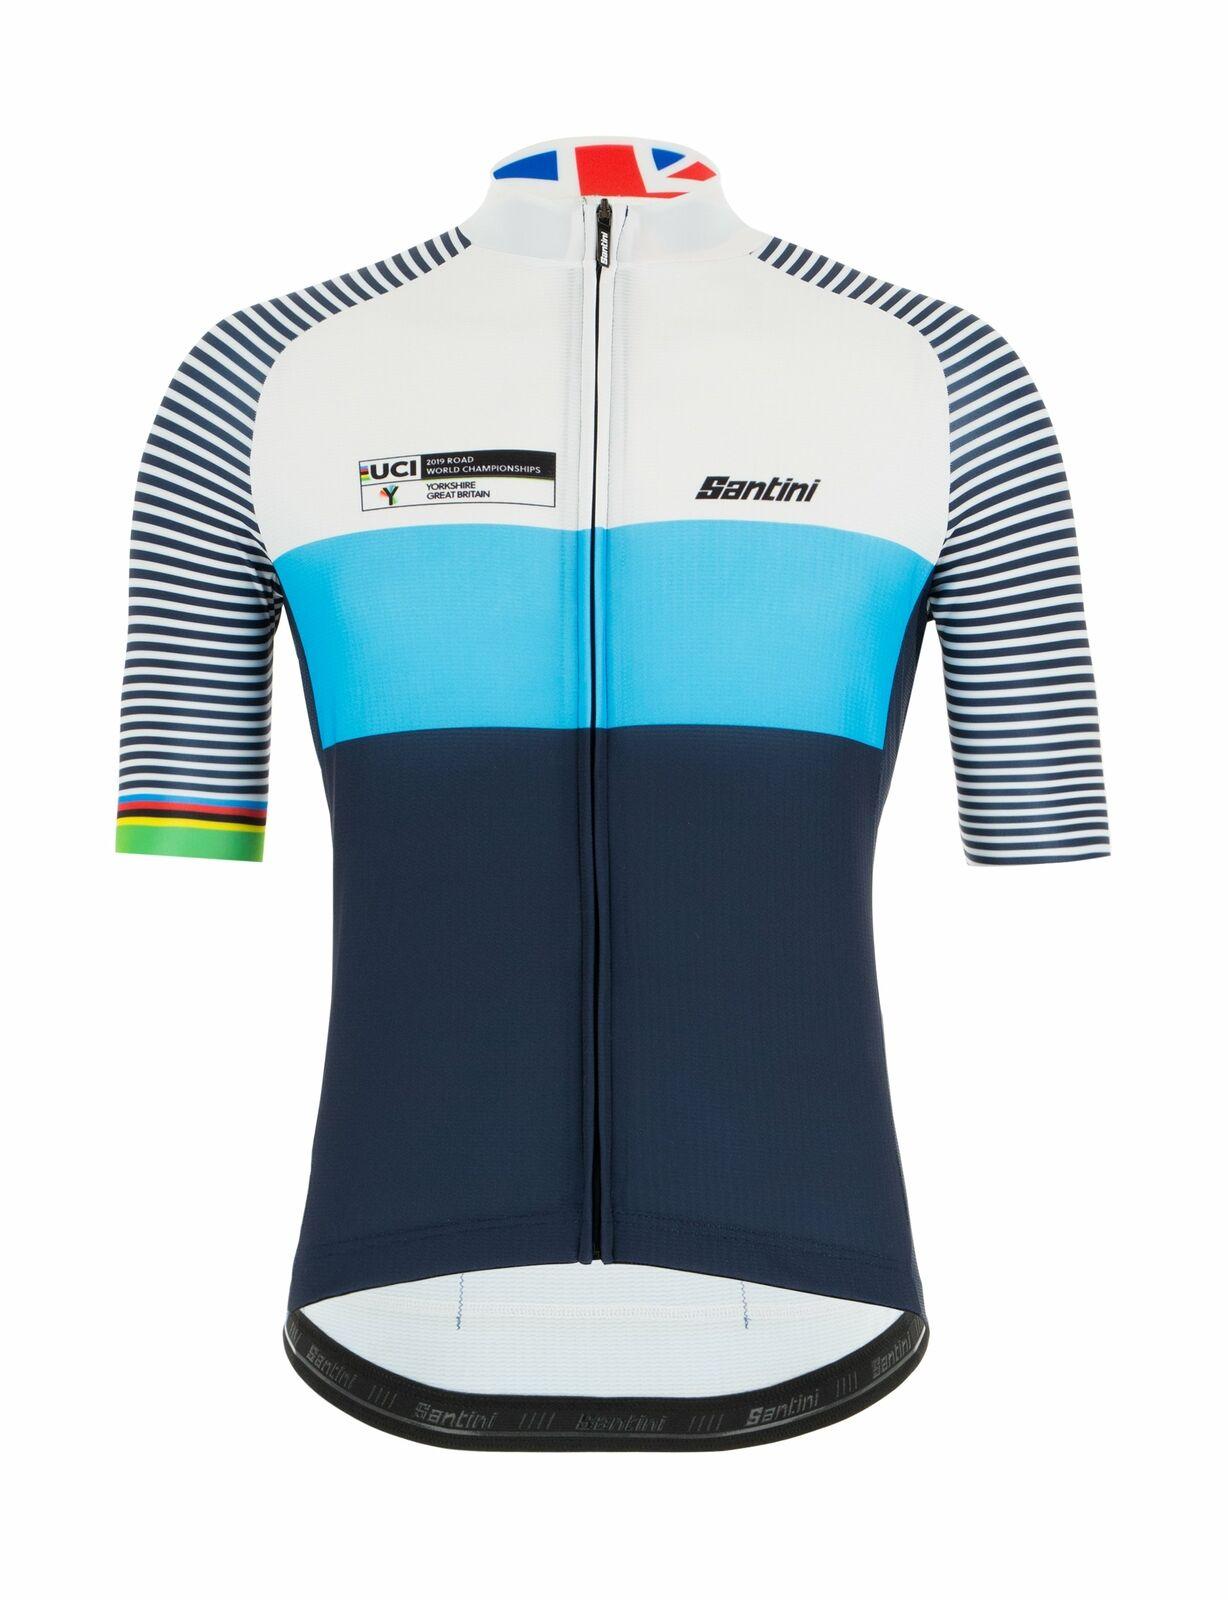 2019 Yorkshire World Championships Legacy Radfahren Jersey by Santini